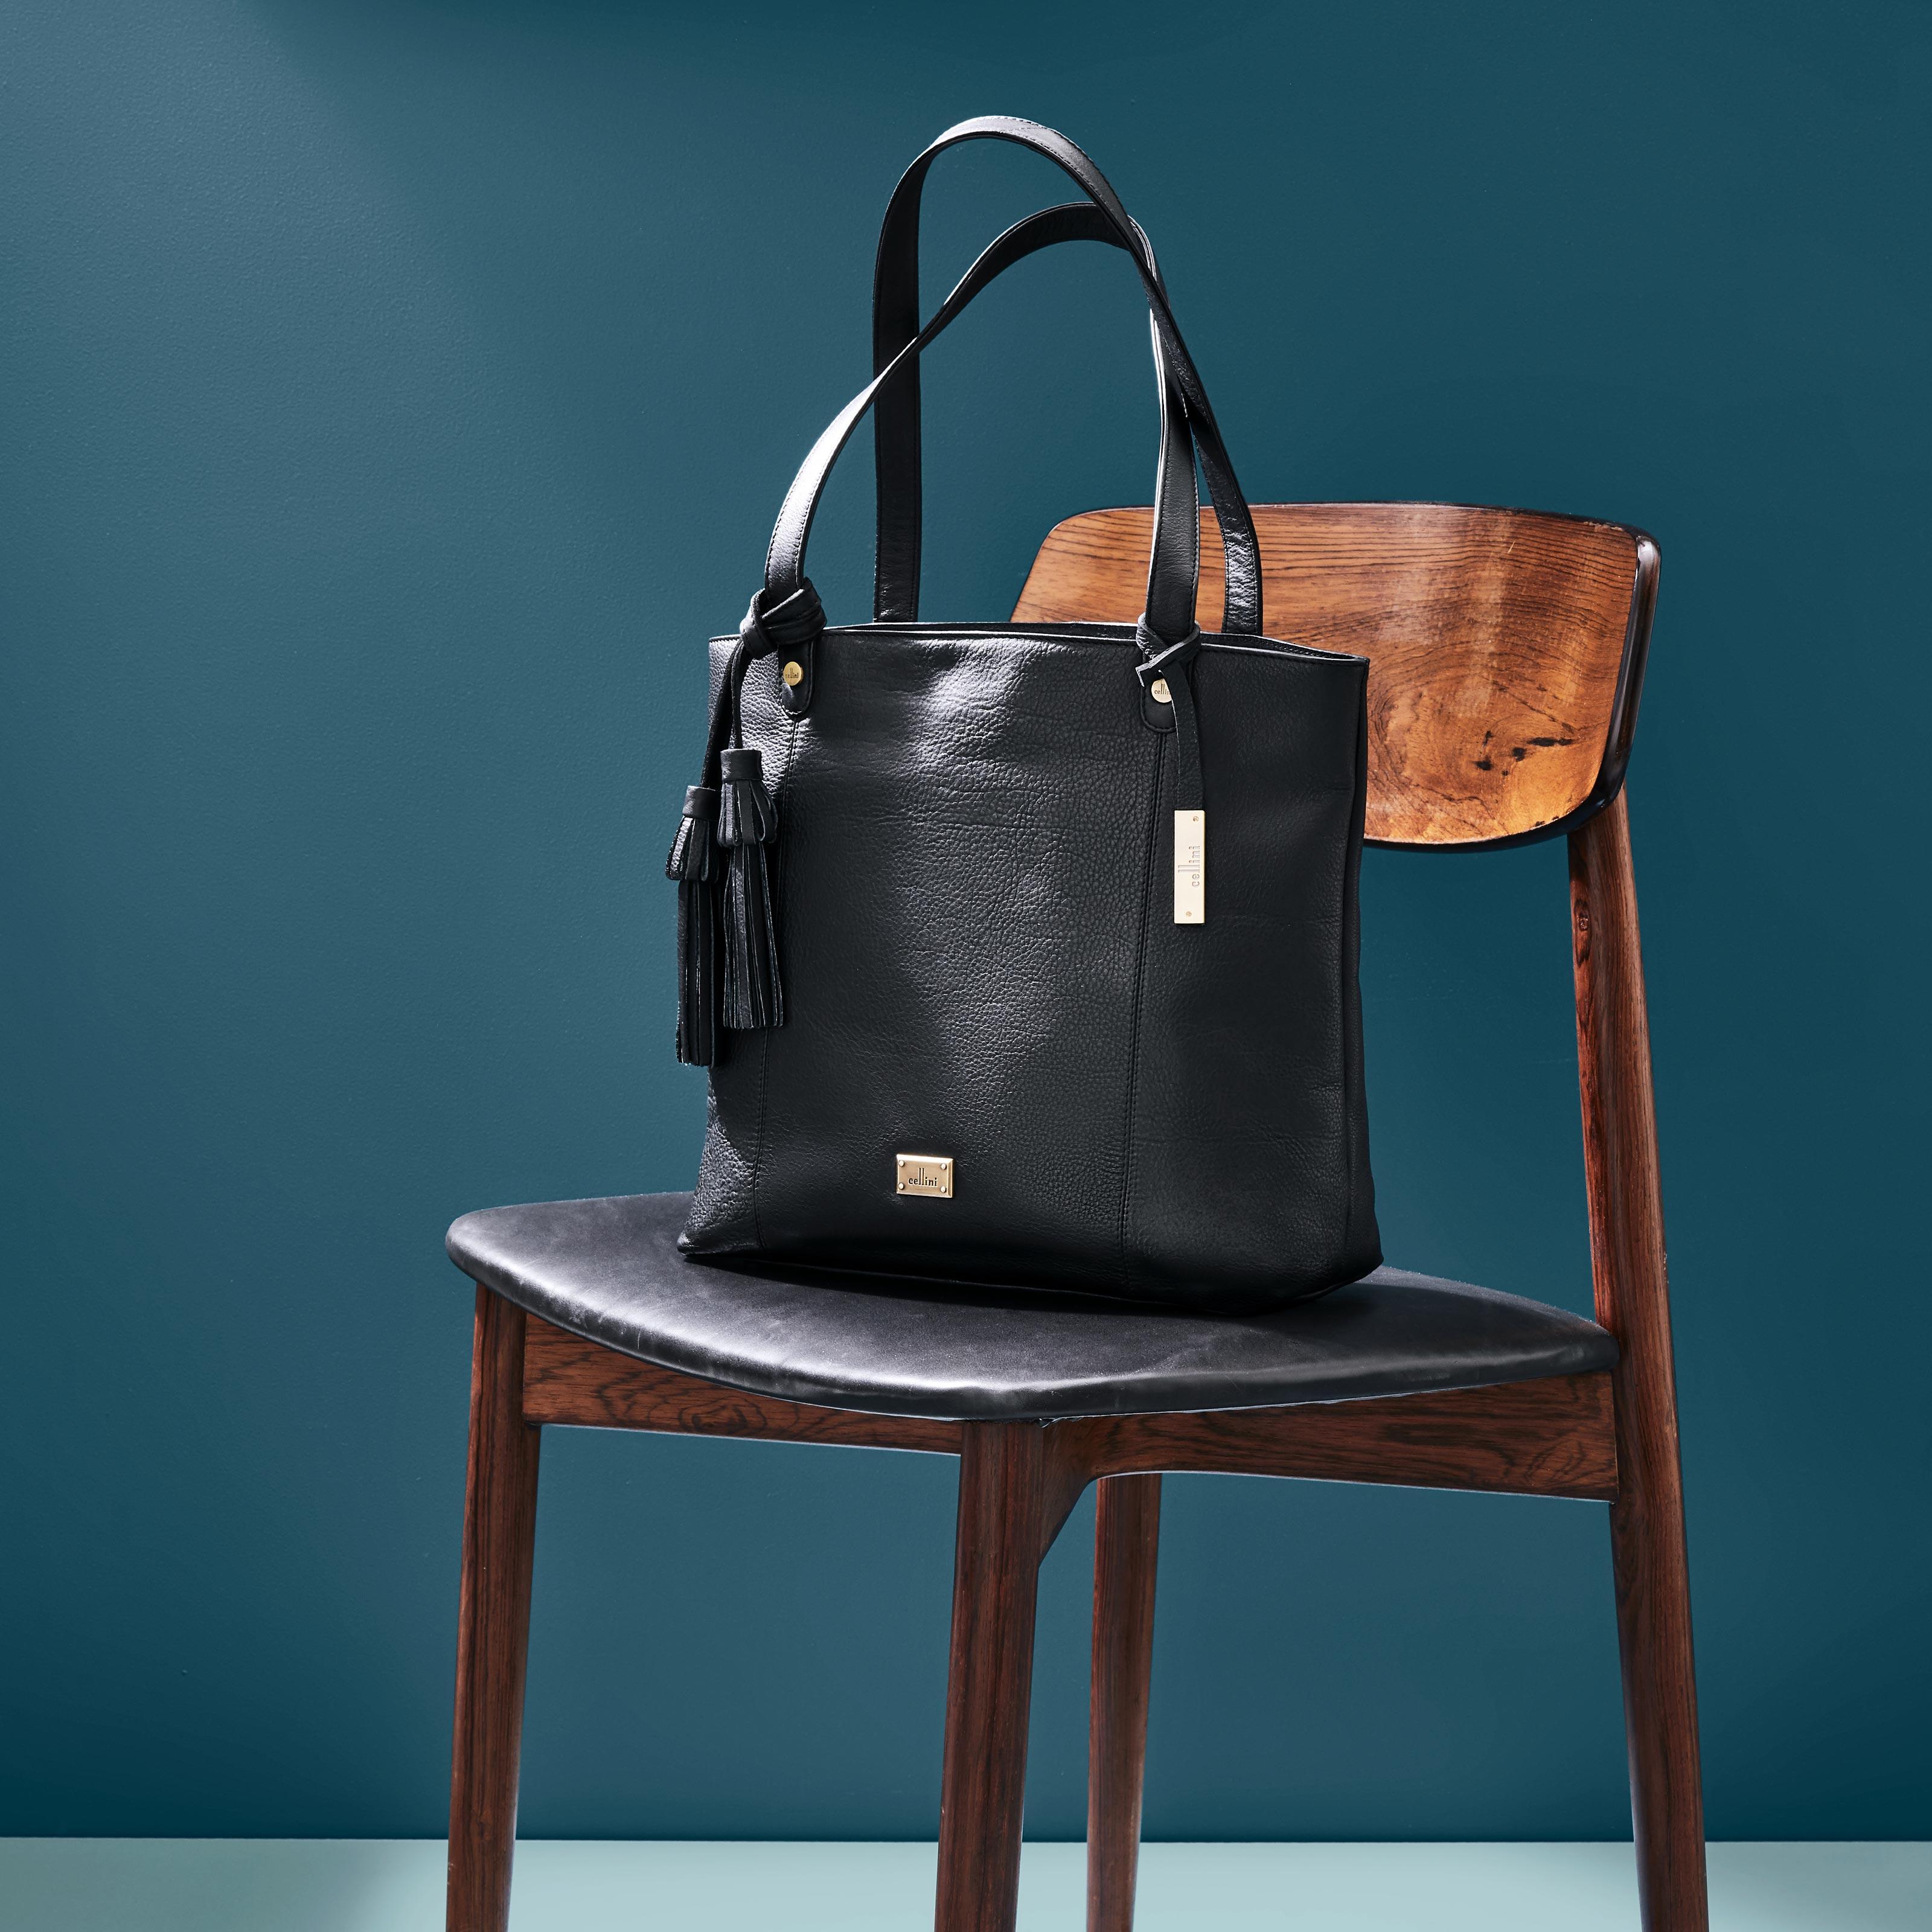 337c2e848afa Modo Handbags Blacktown - Foto Handbag All Collections Salonagafiya.Com